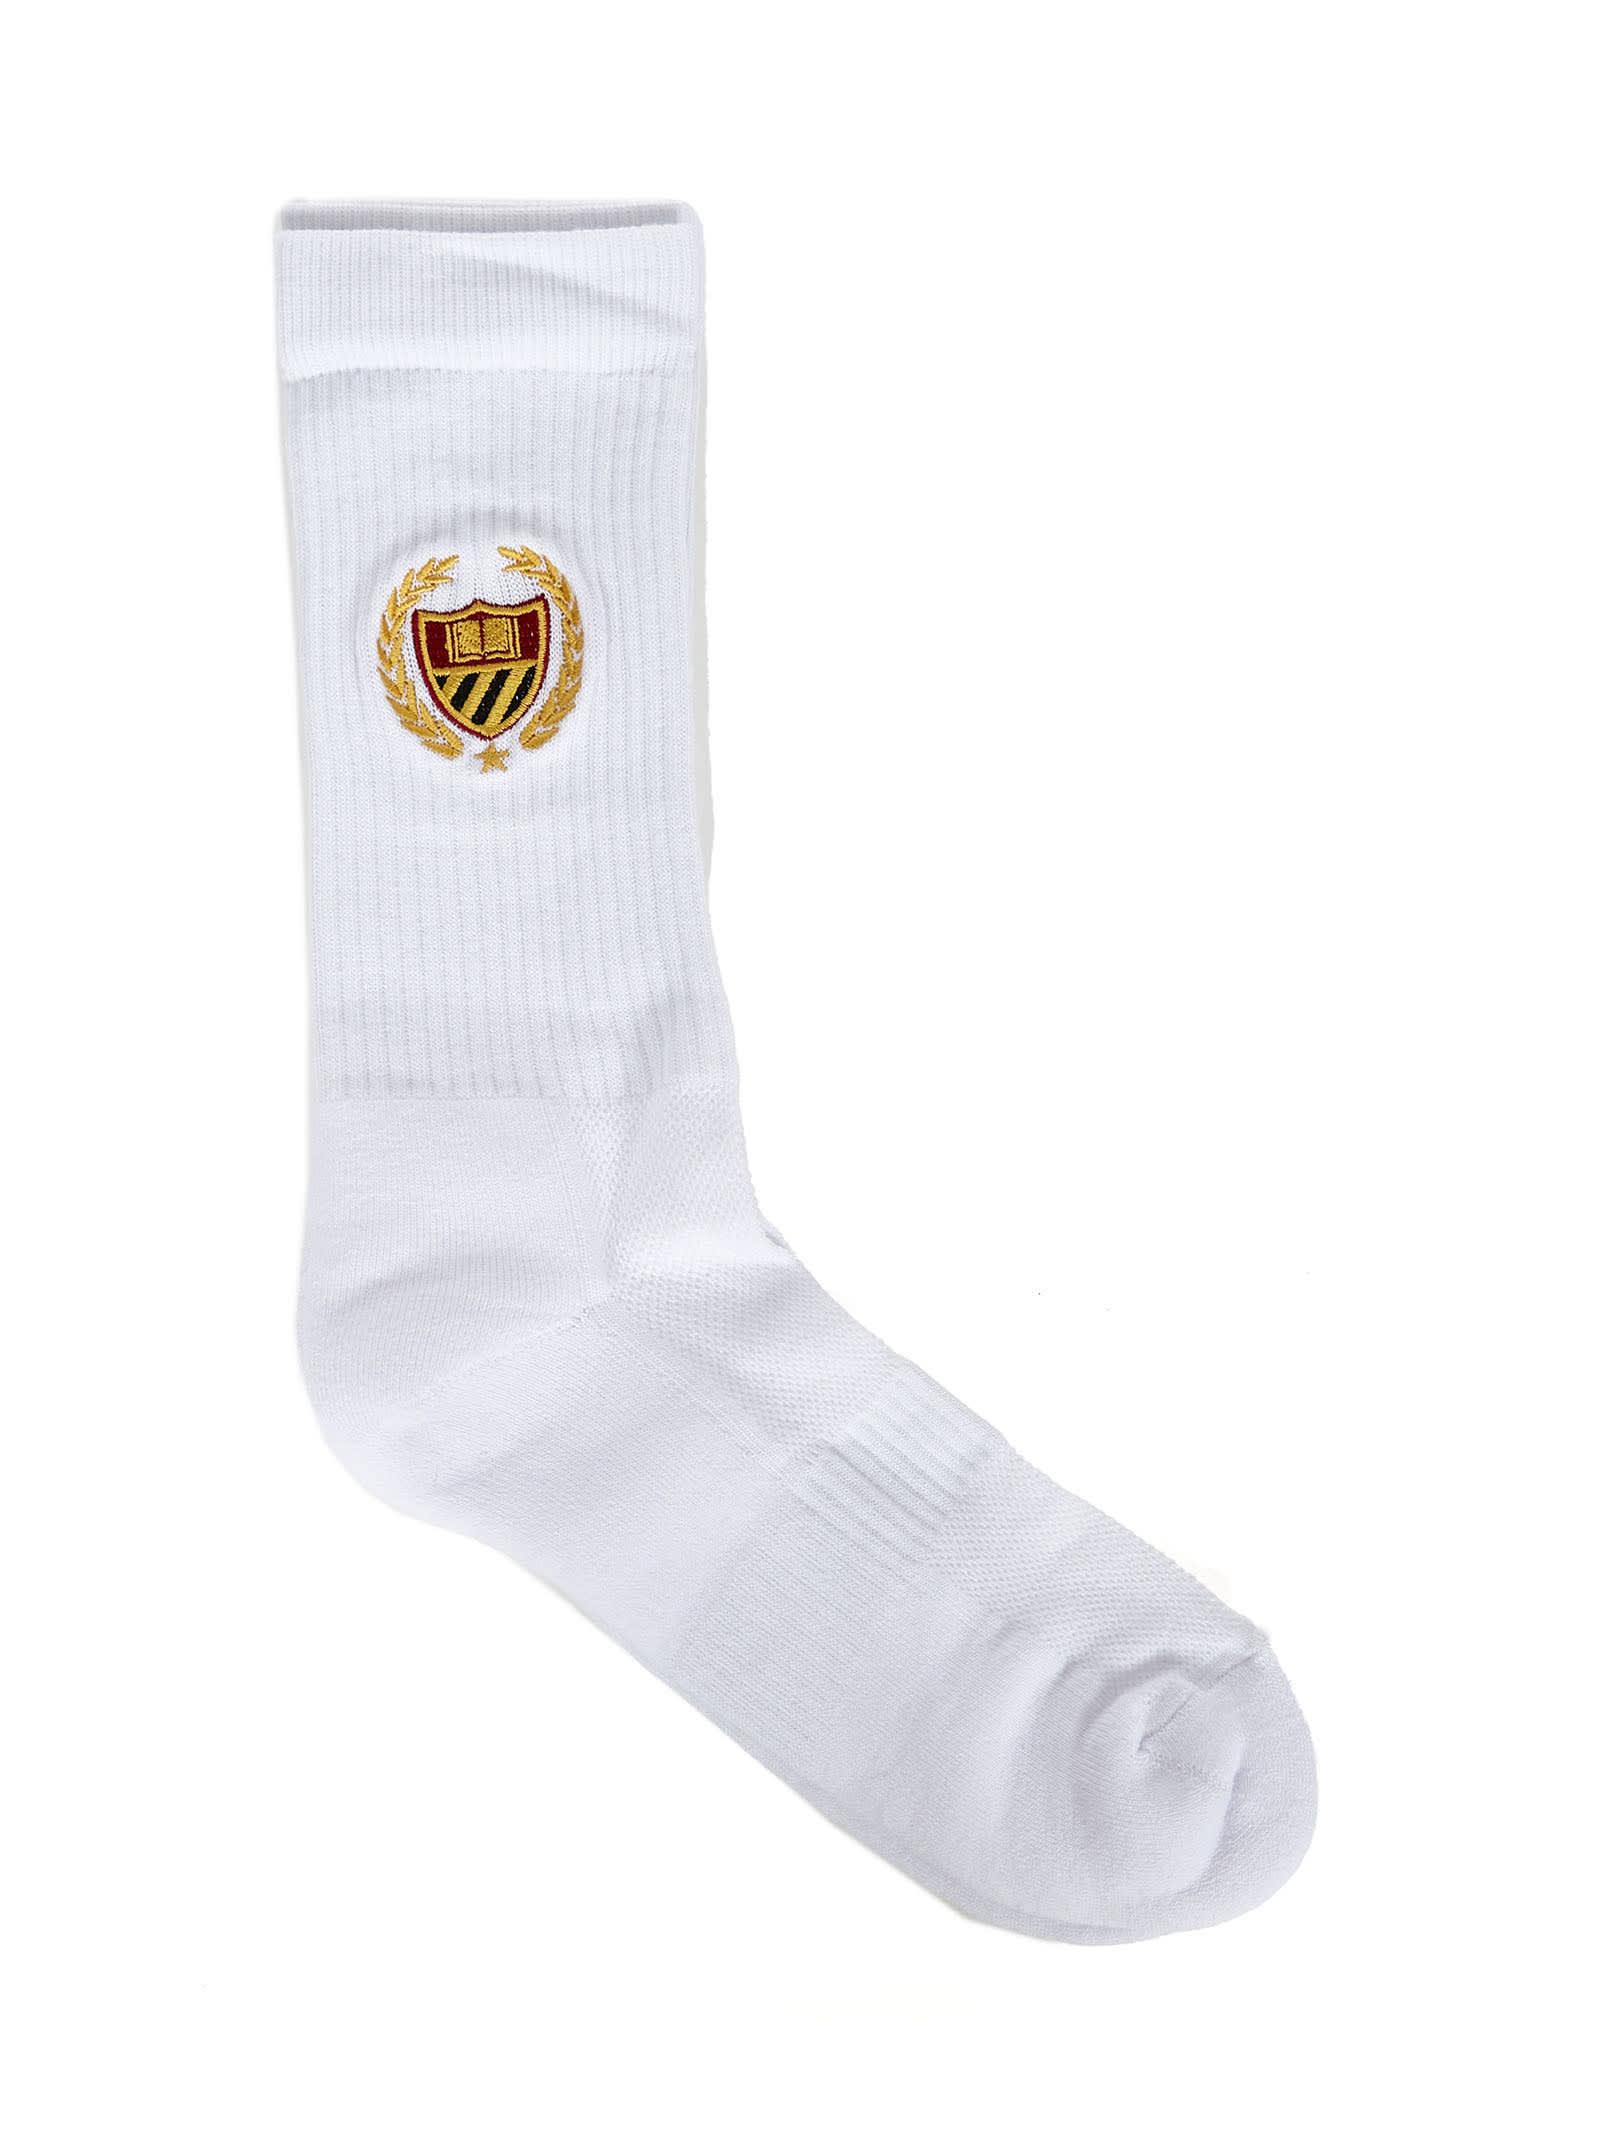 Bel-air Athletics Socks